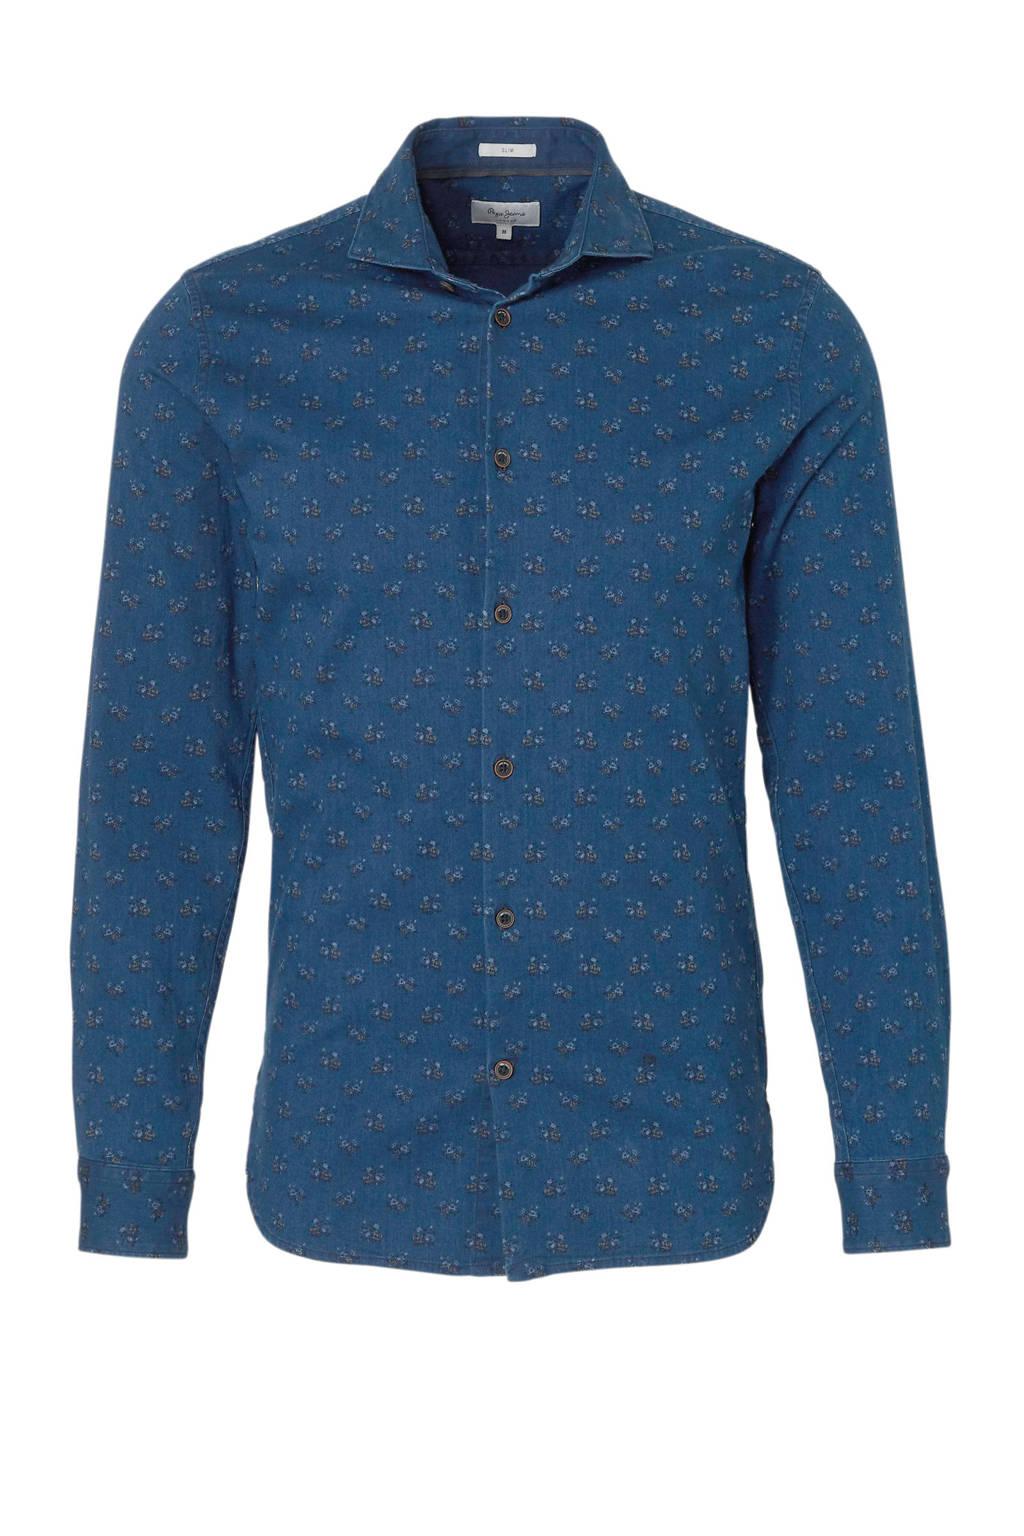 Gebloemd Overhemd.Pepe Jeans Gebloemd Overhemd Axel Denim Wehkamp